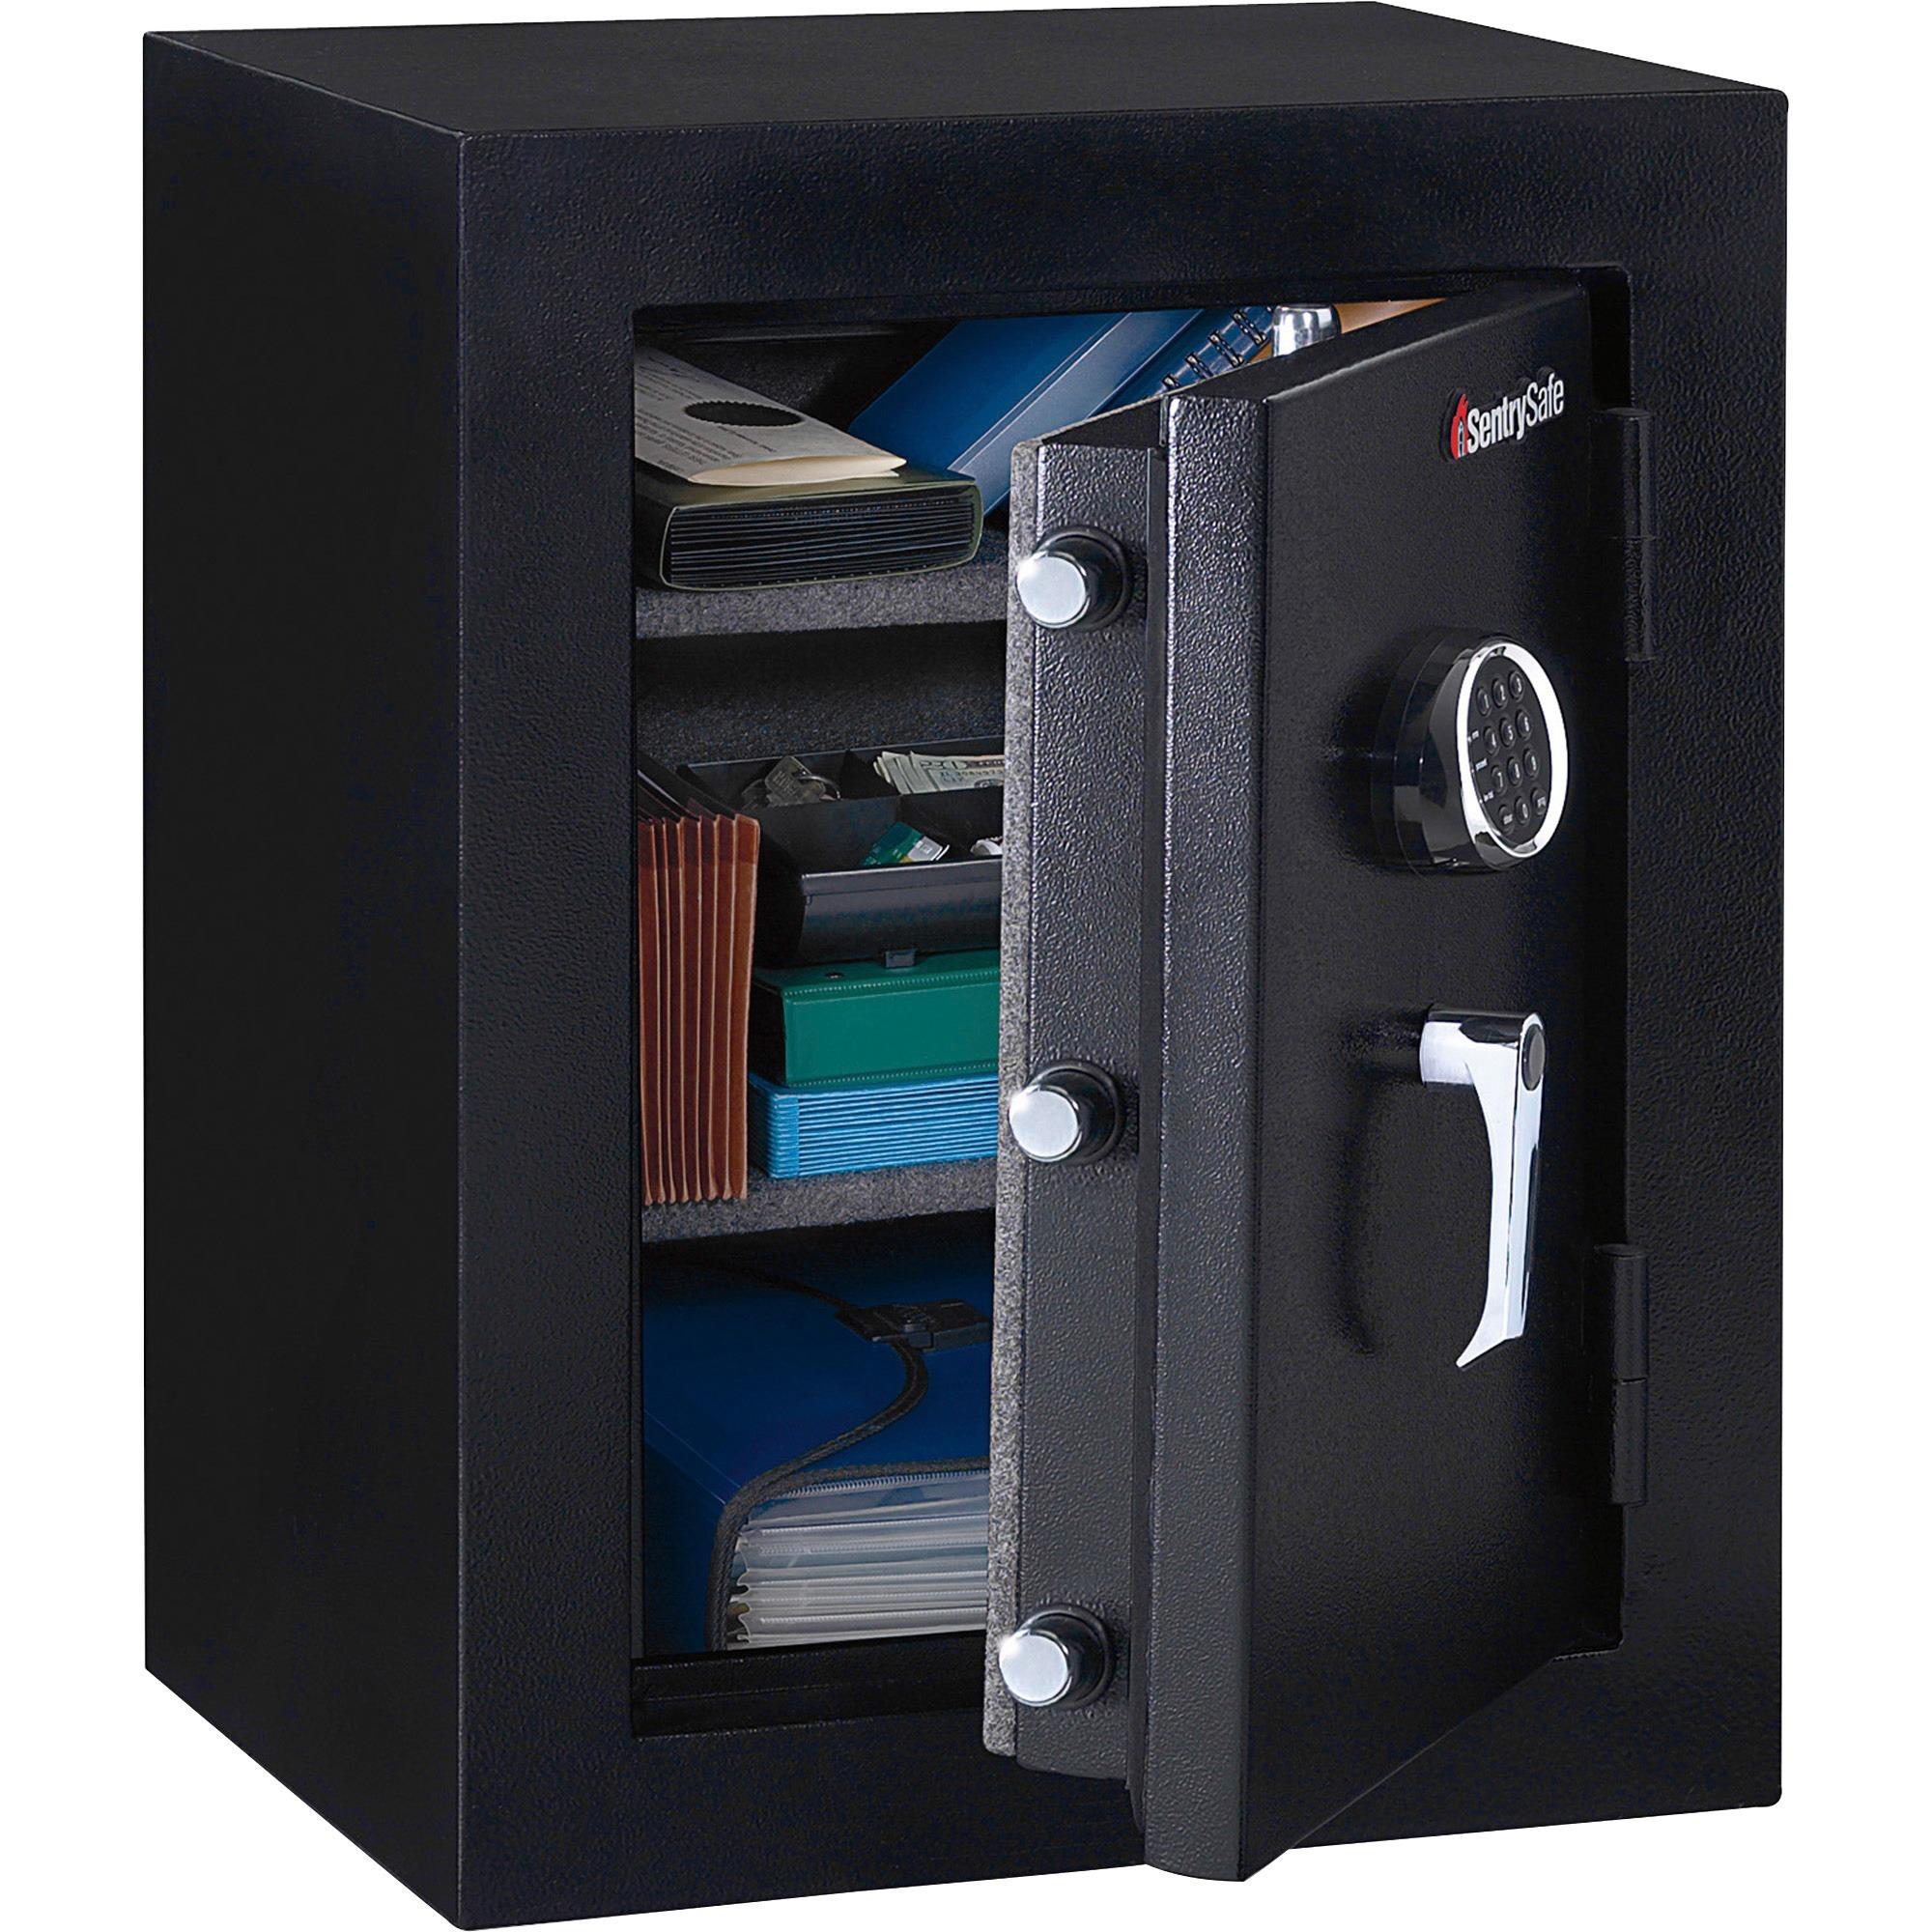 Sentry Safe Fire-Safe Executive Safe - Each